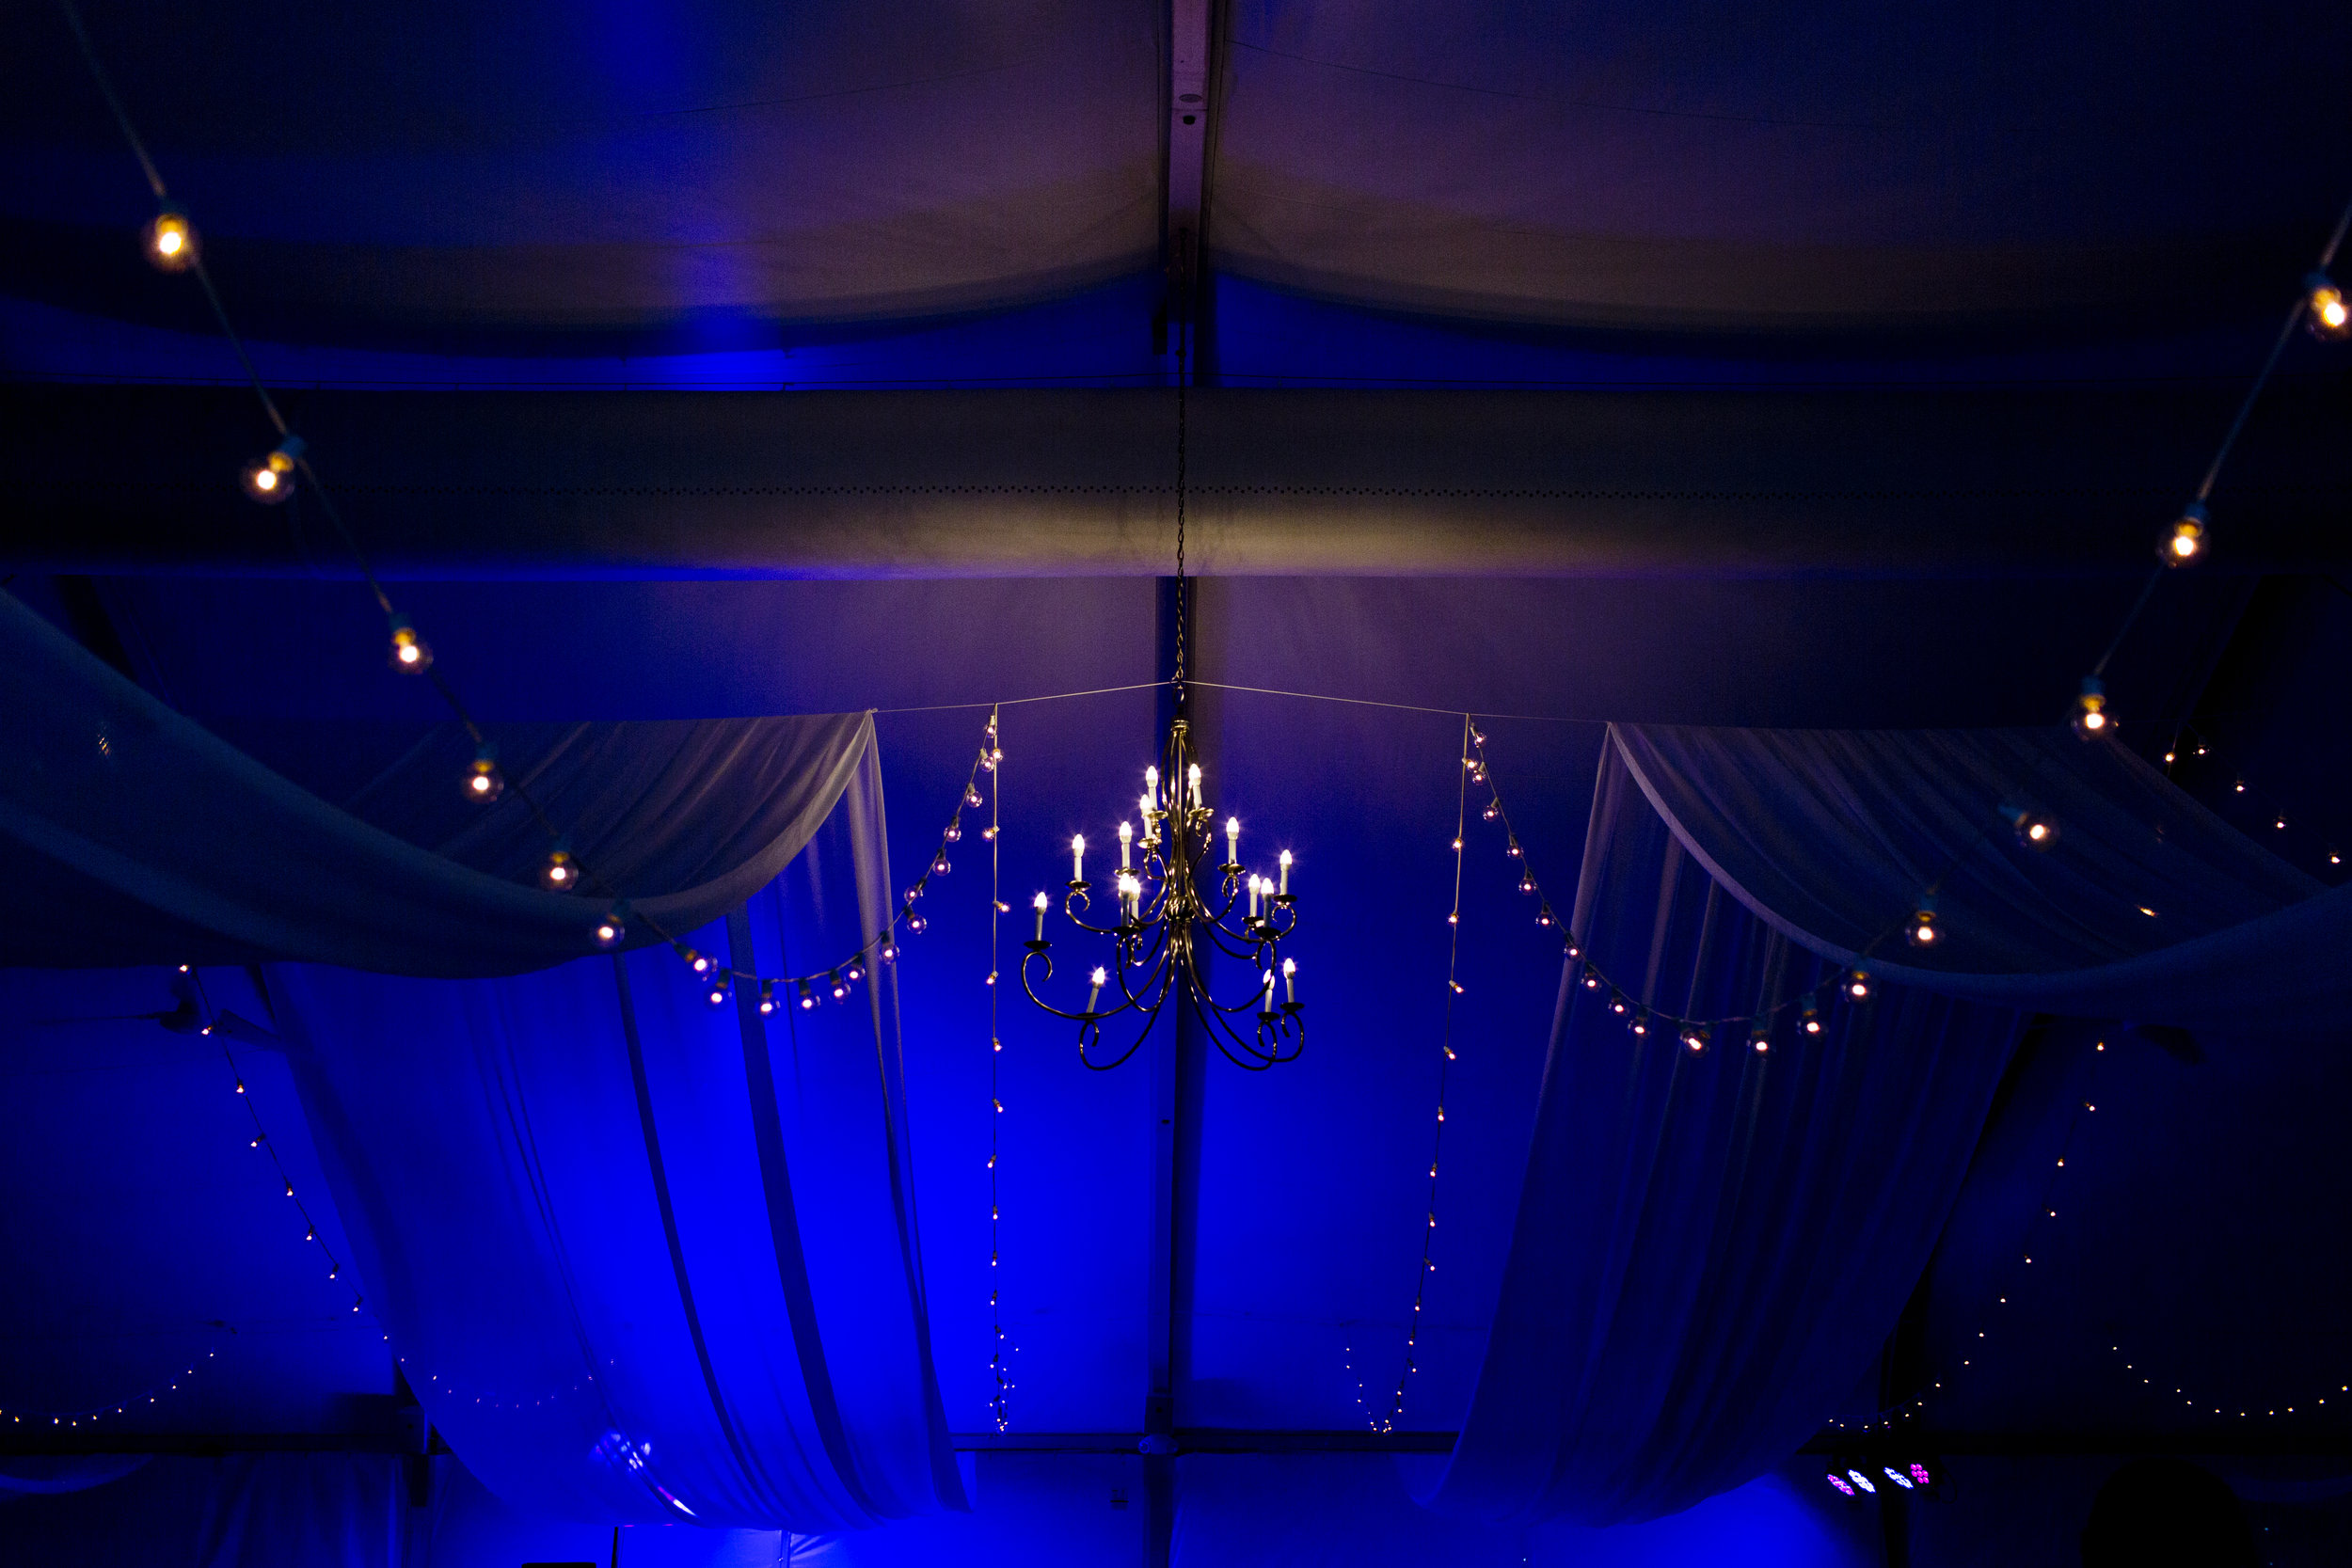 tent-wedding-lighting-photo